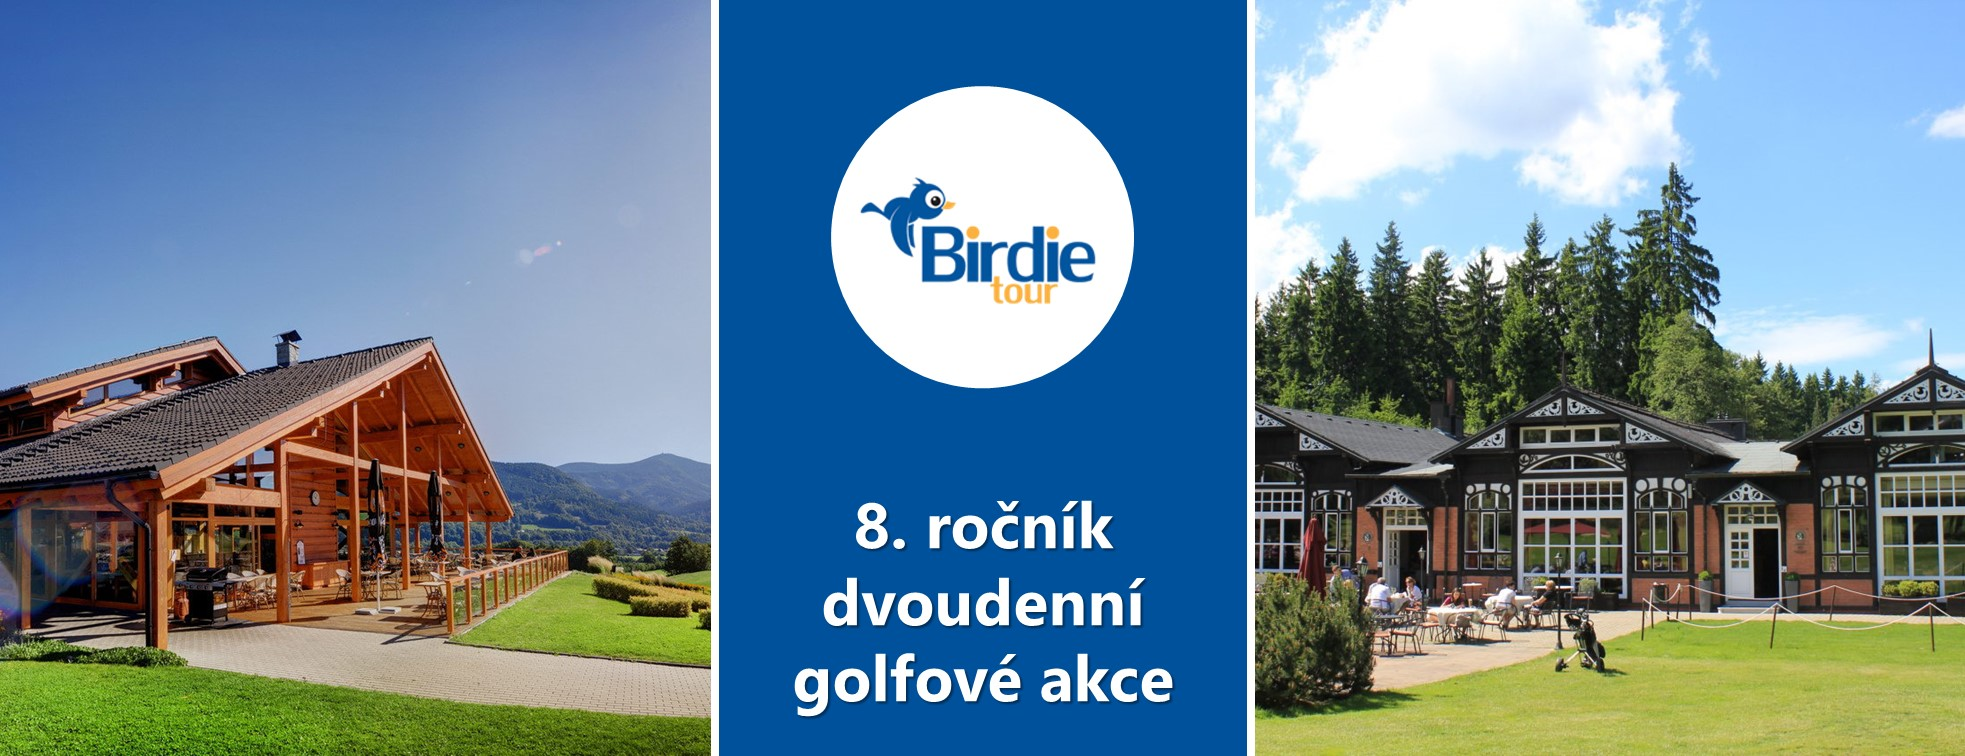 2022_Birdie